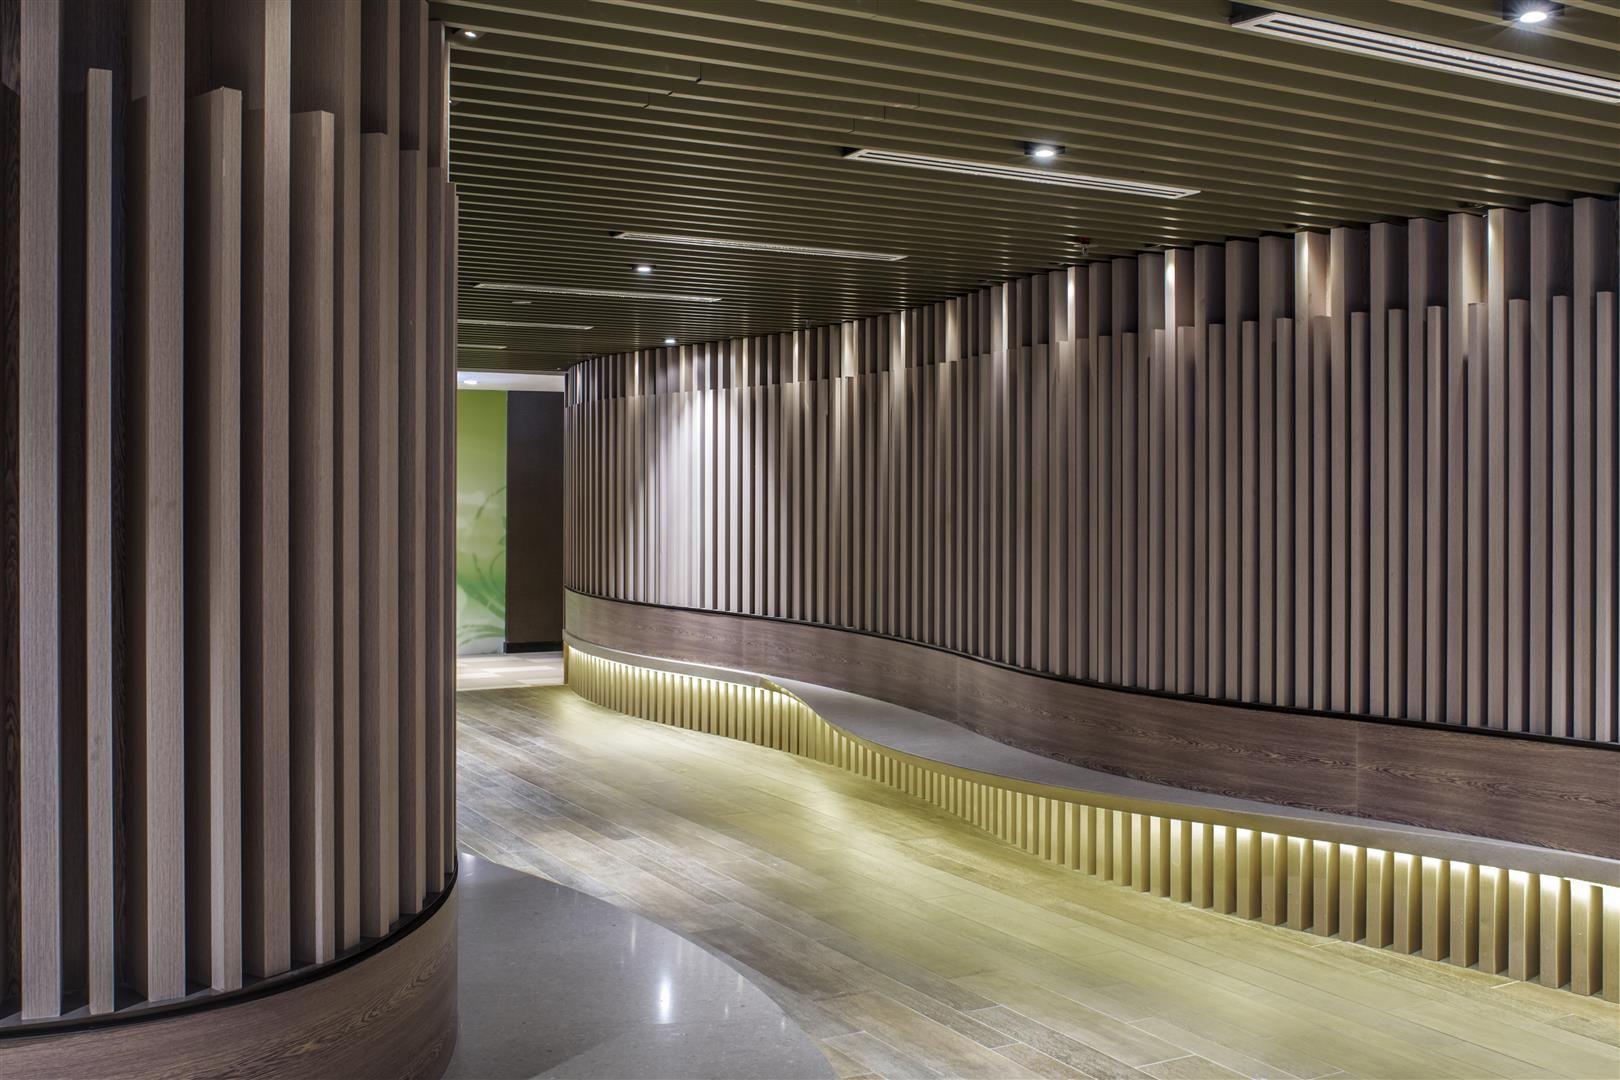 Corridor Design: Corridor / Wood Louvers / Curves At Shaw Centre Singapore